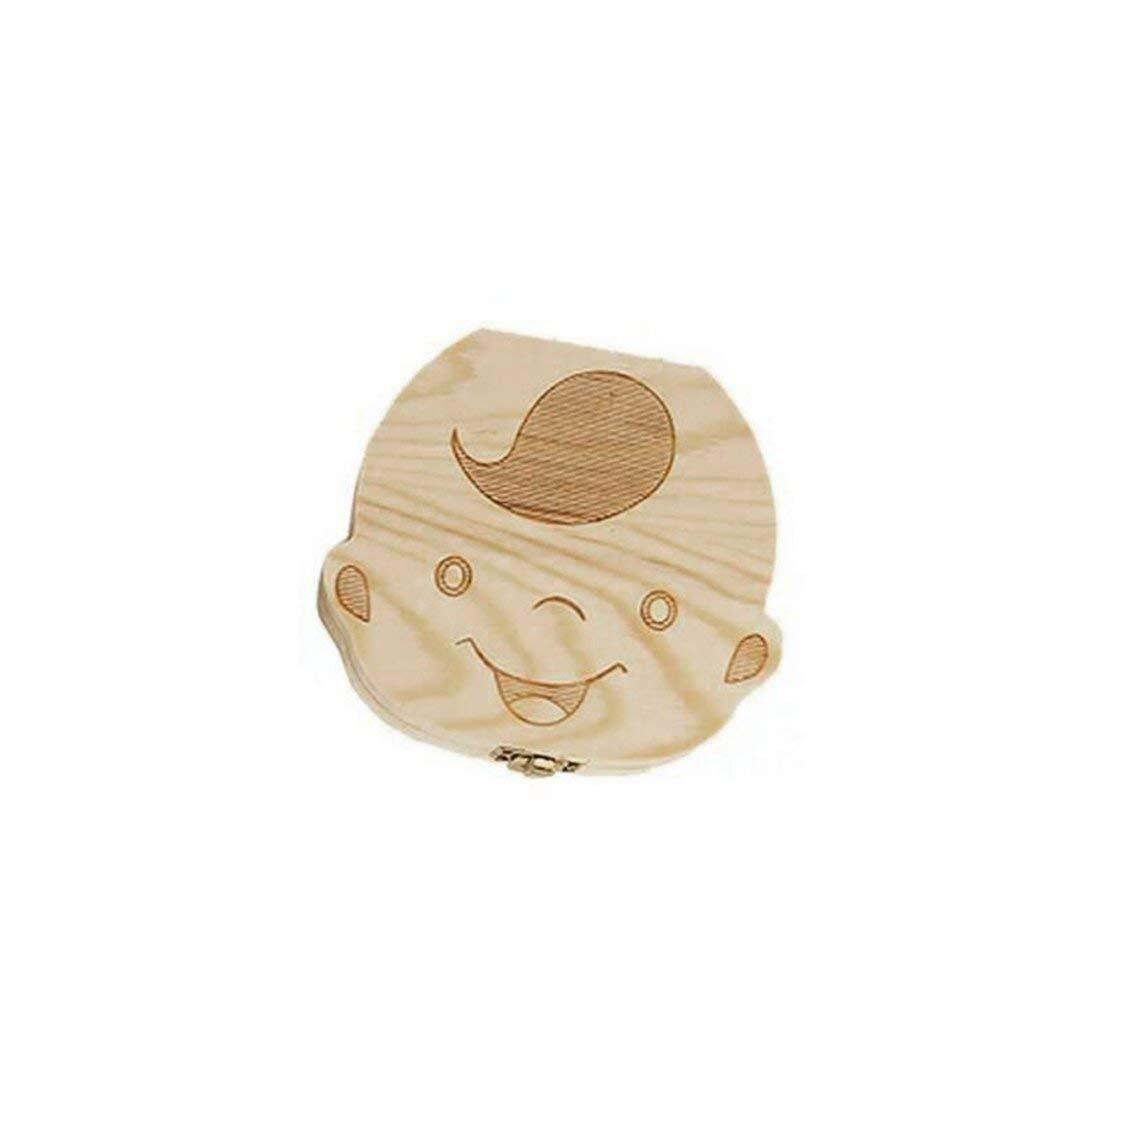 Boys 11.5 3 cm 1X Lovely Baby Teeth Save Box Organizer Tooth Collection Souvenir Case Wooden Handmade Keepsake Durable 12